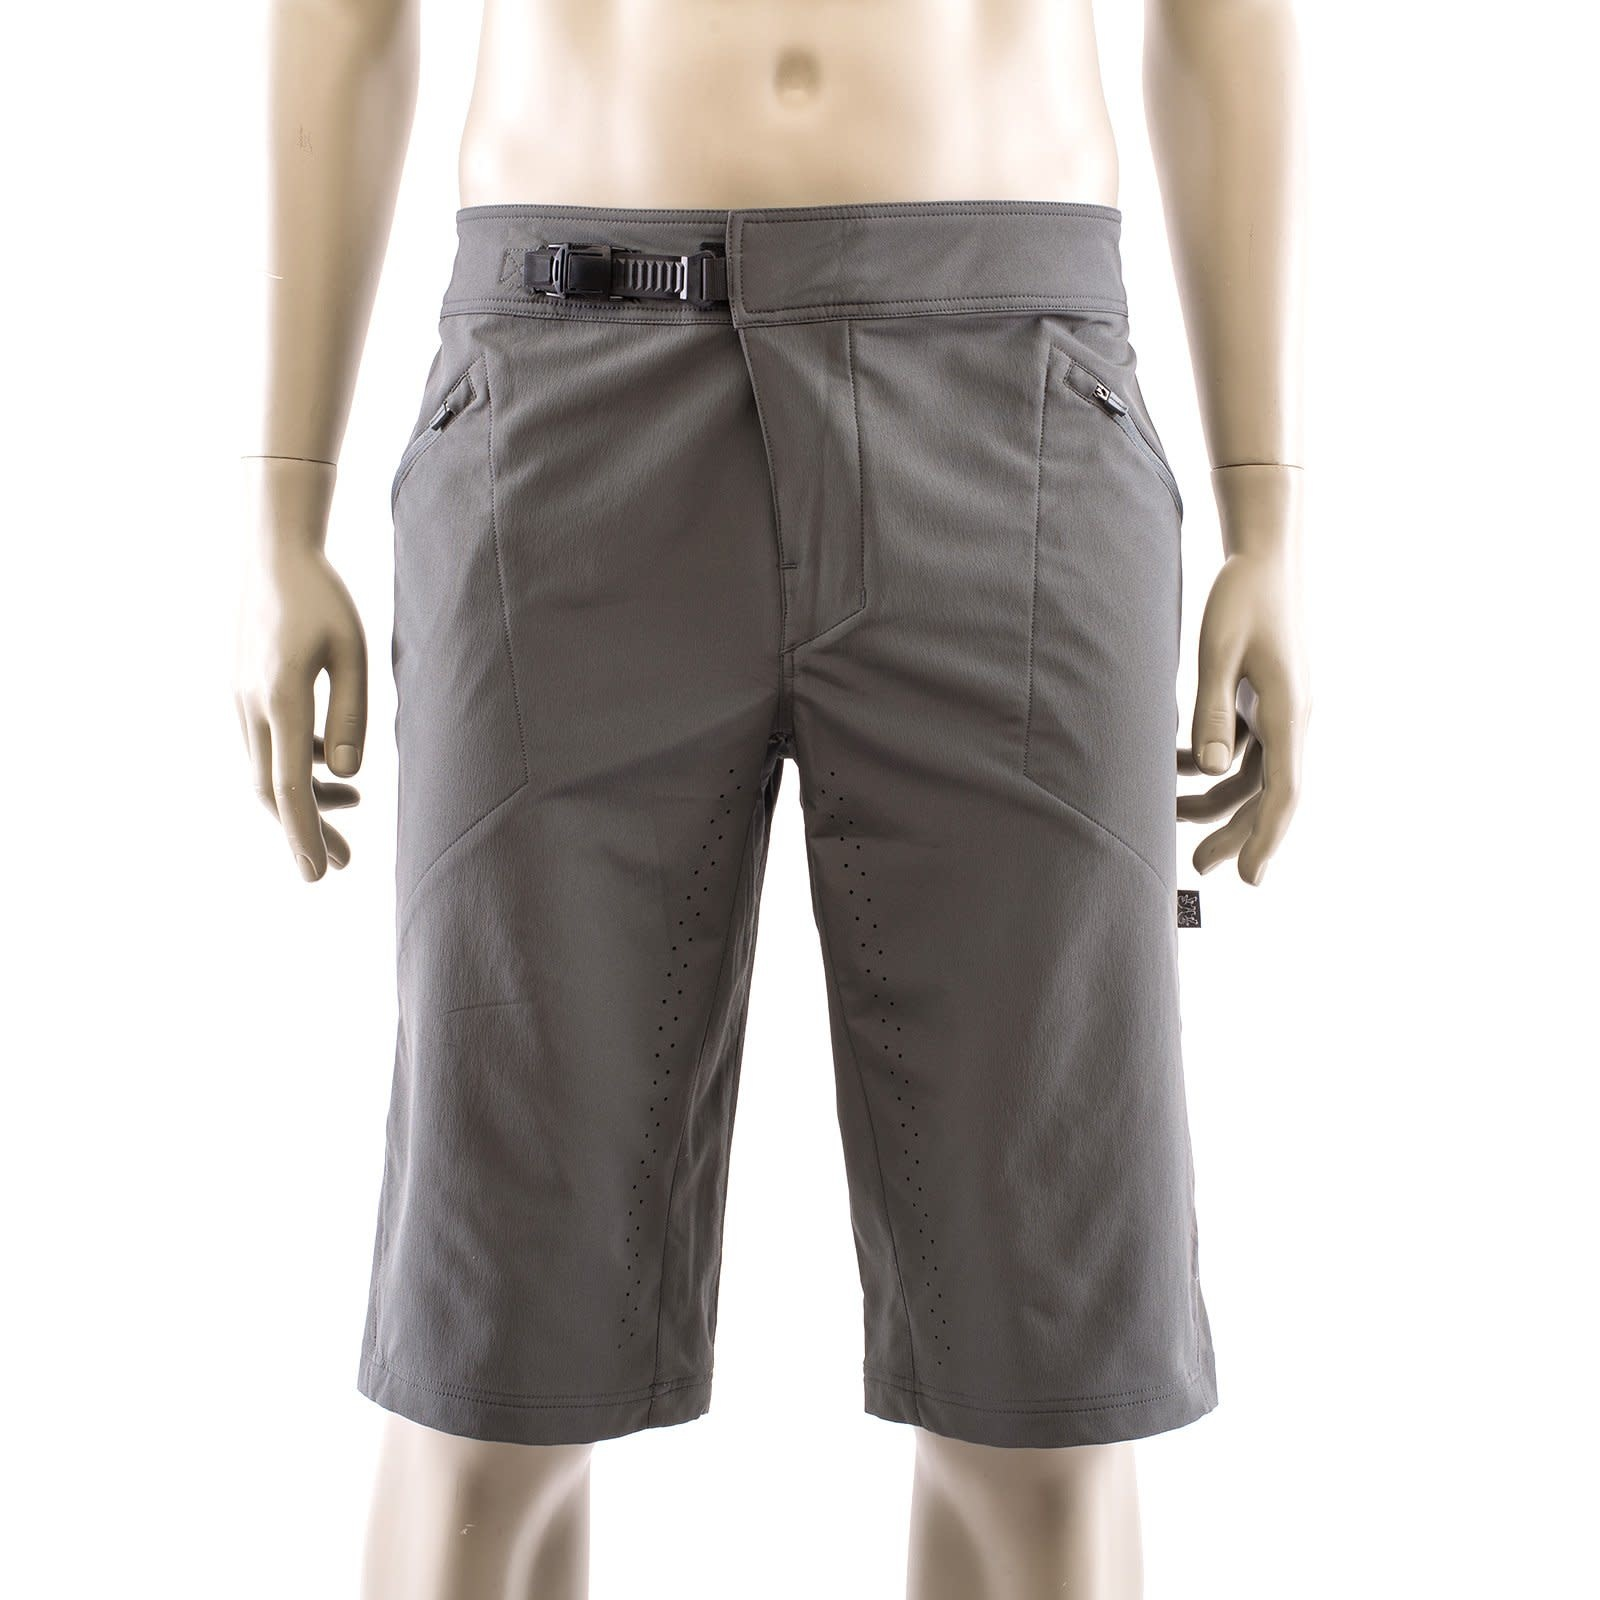 Shorts, Chromag Ambit mens